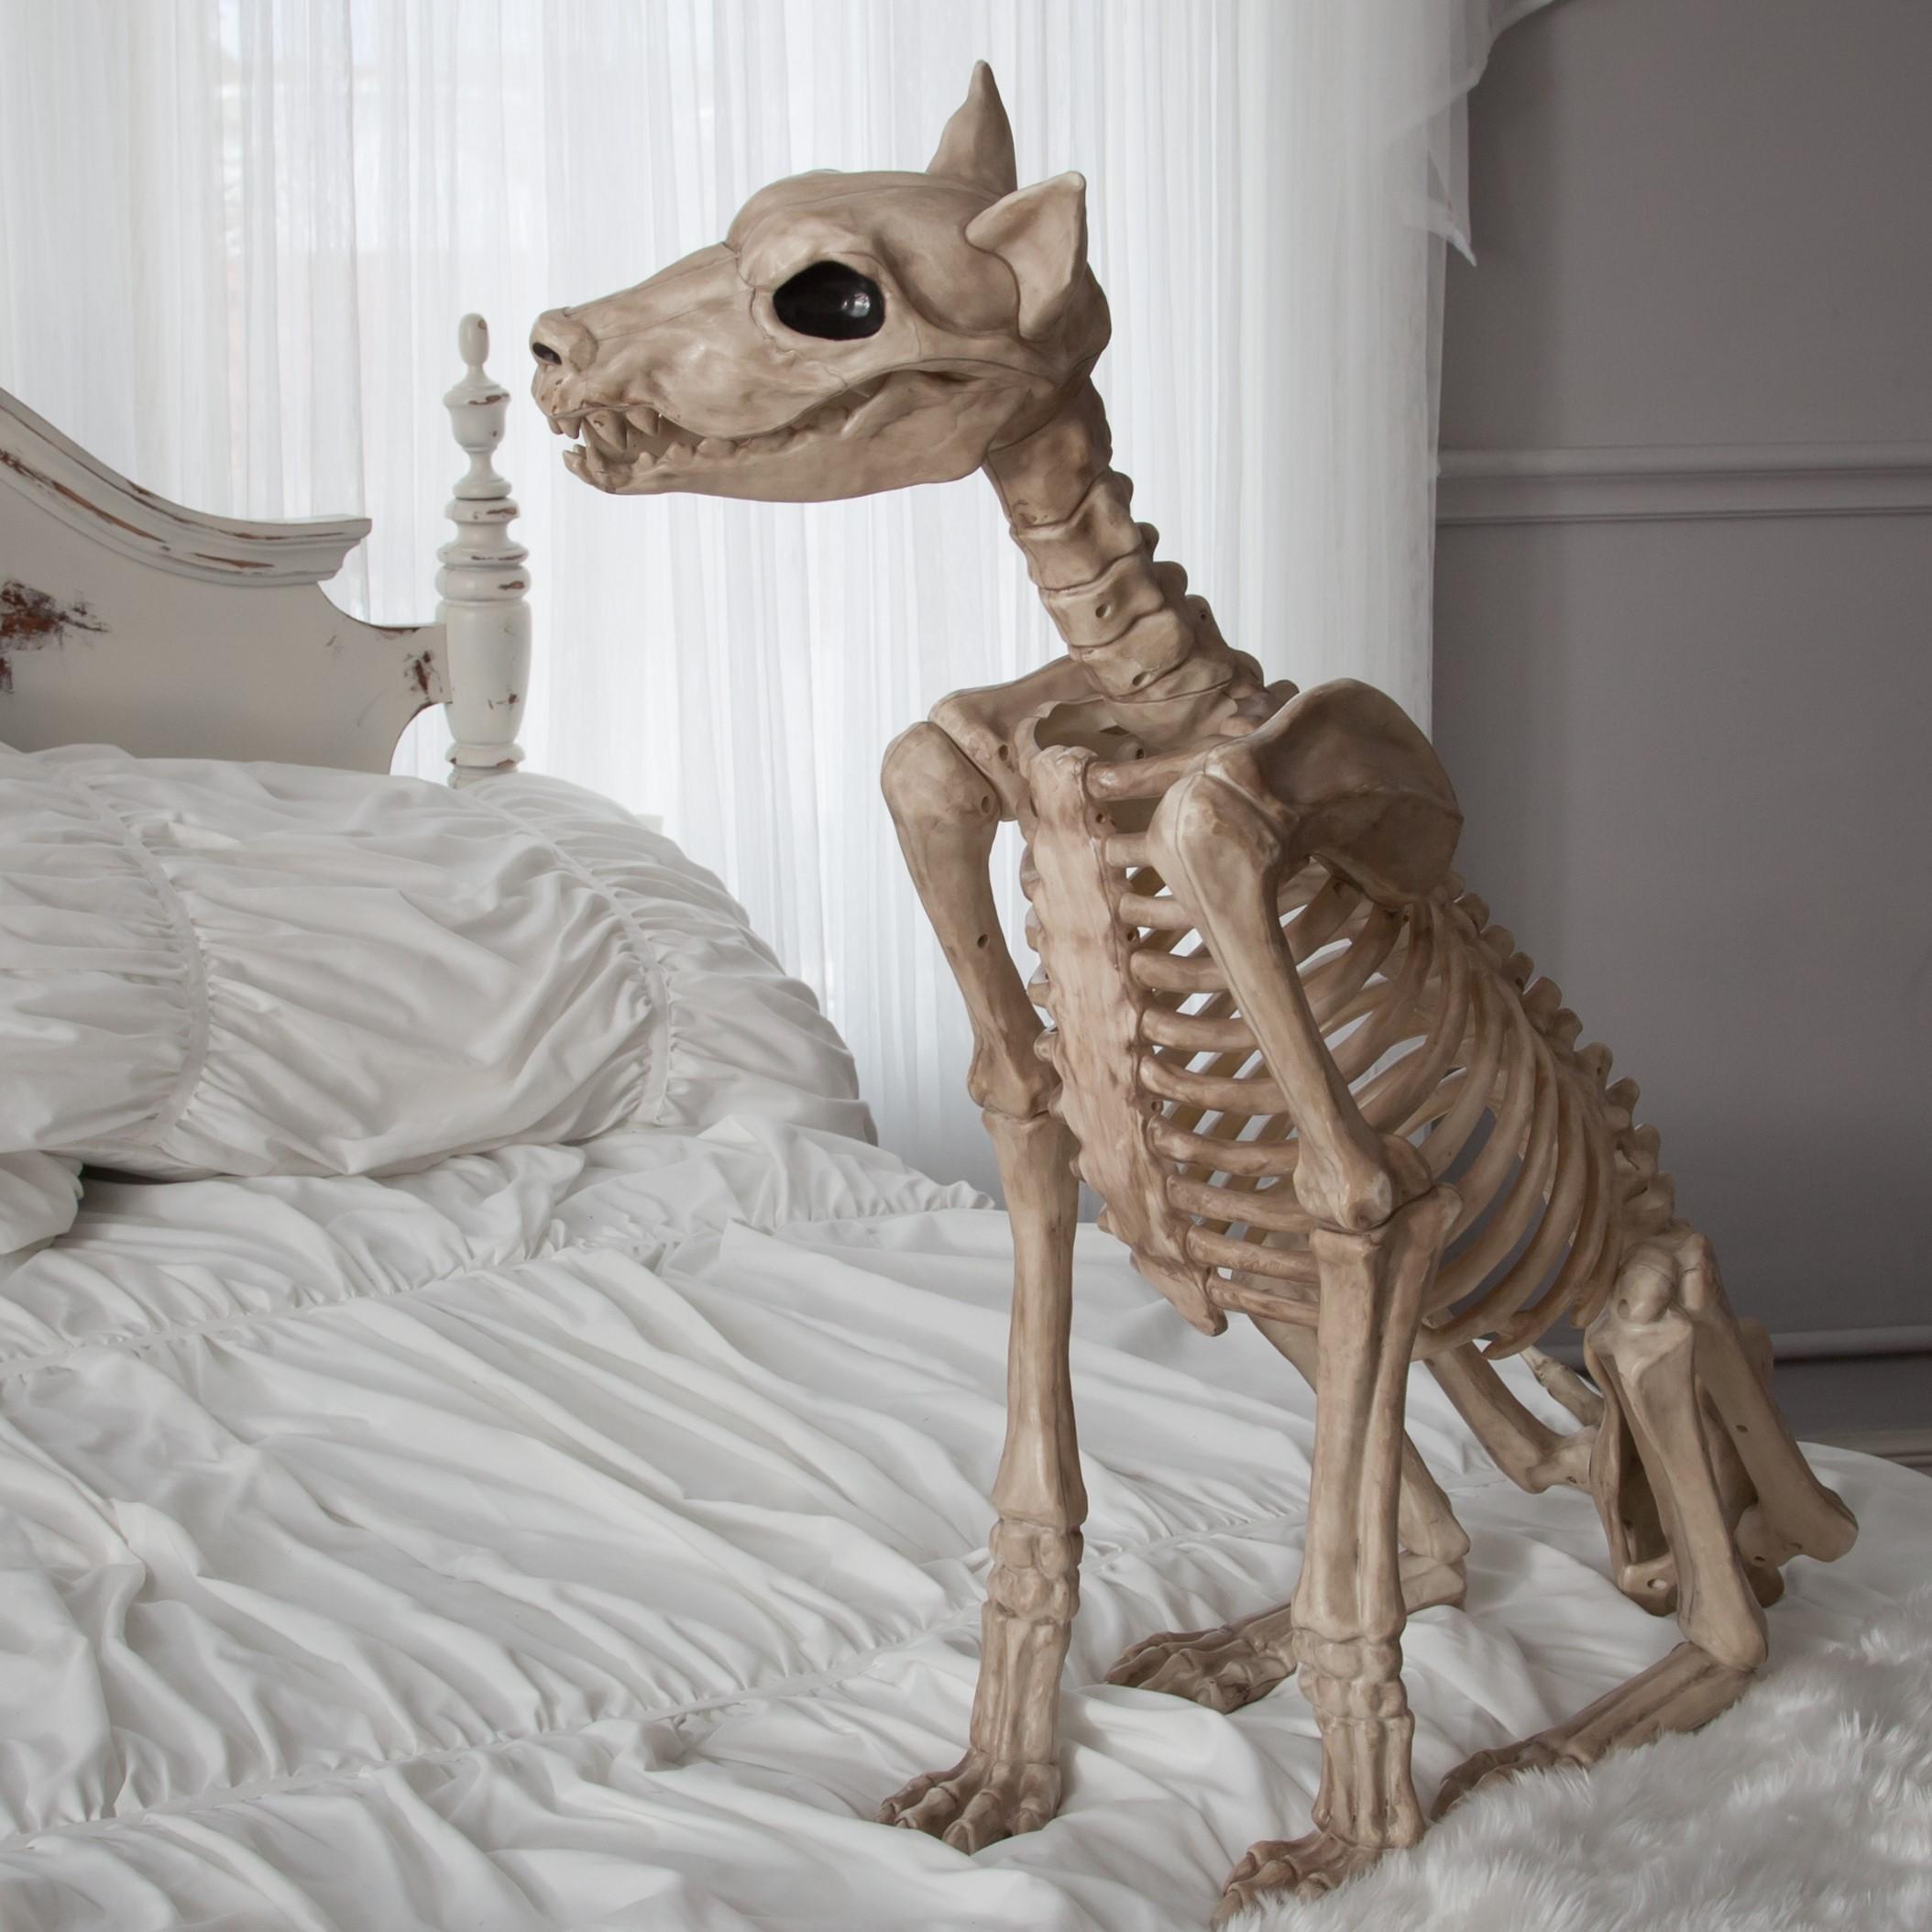 Amazon.com: Crazy Bonez Skeleton Dog - Badger Bonez: Toys